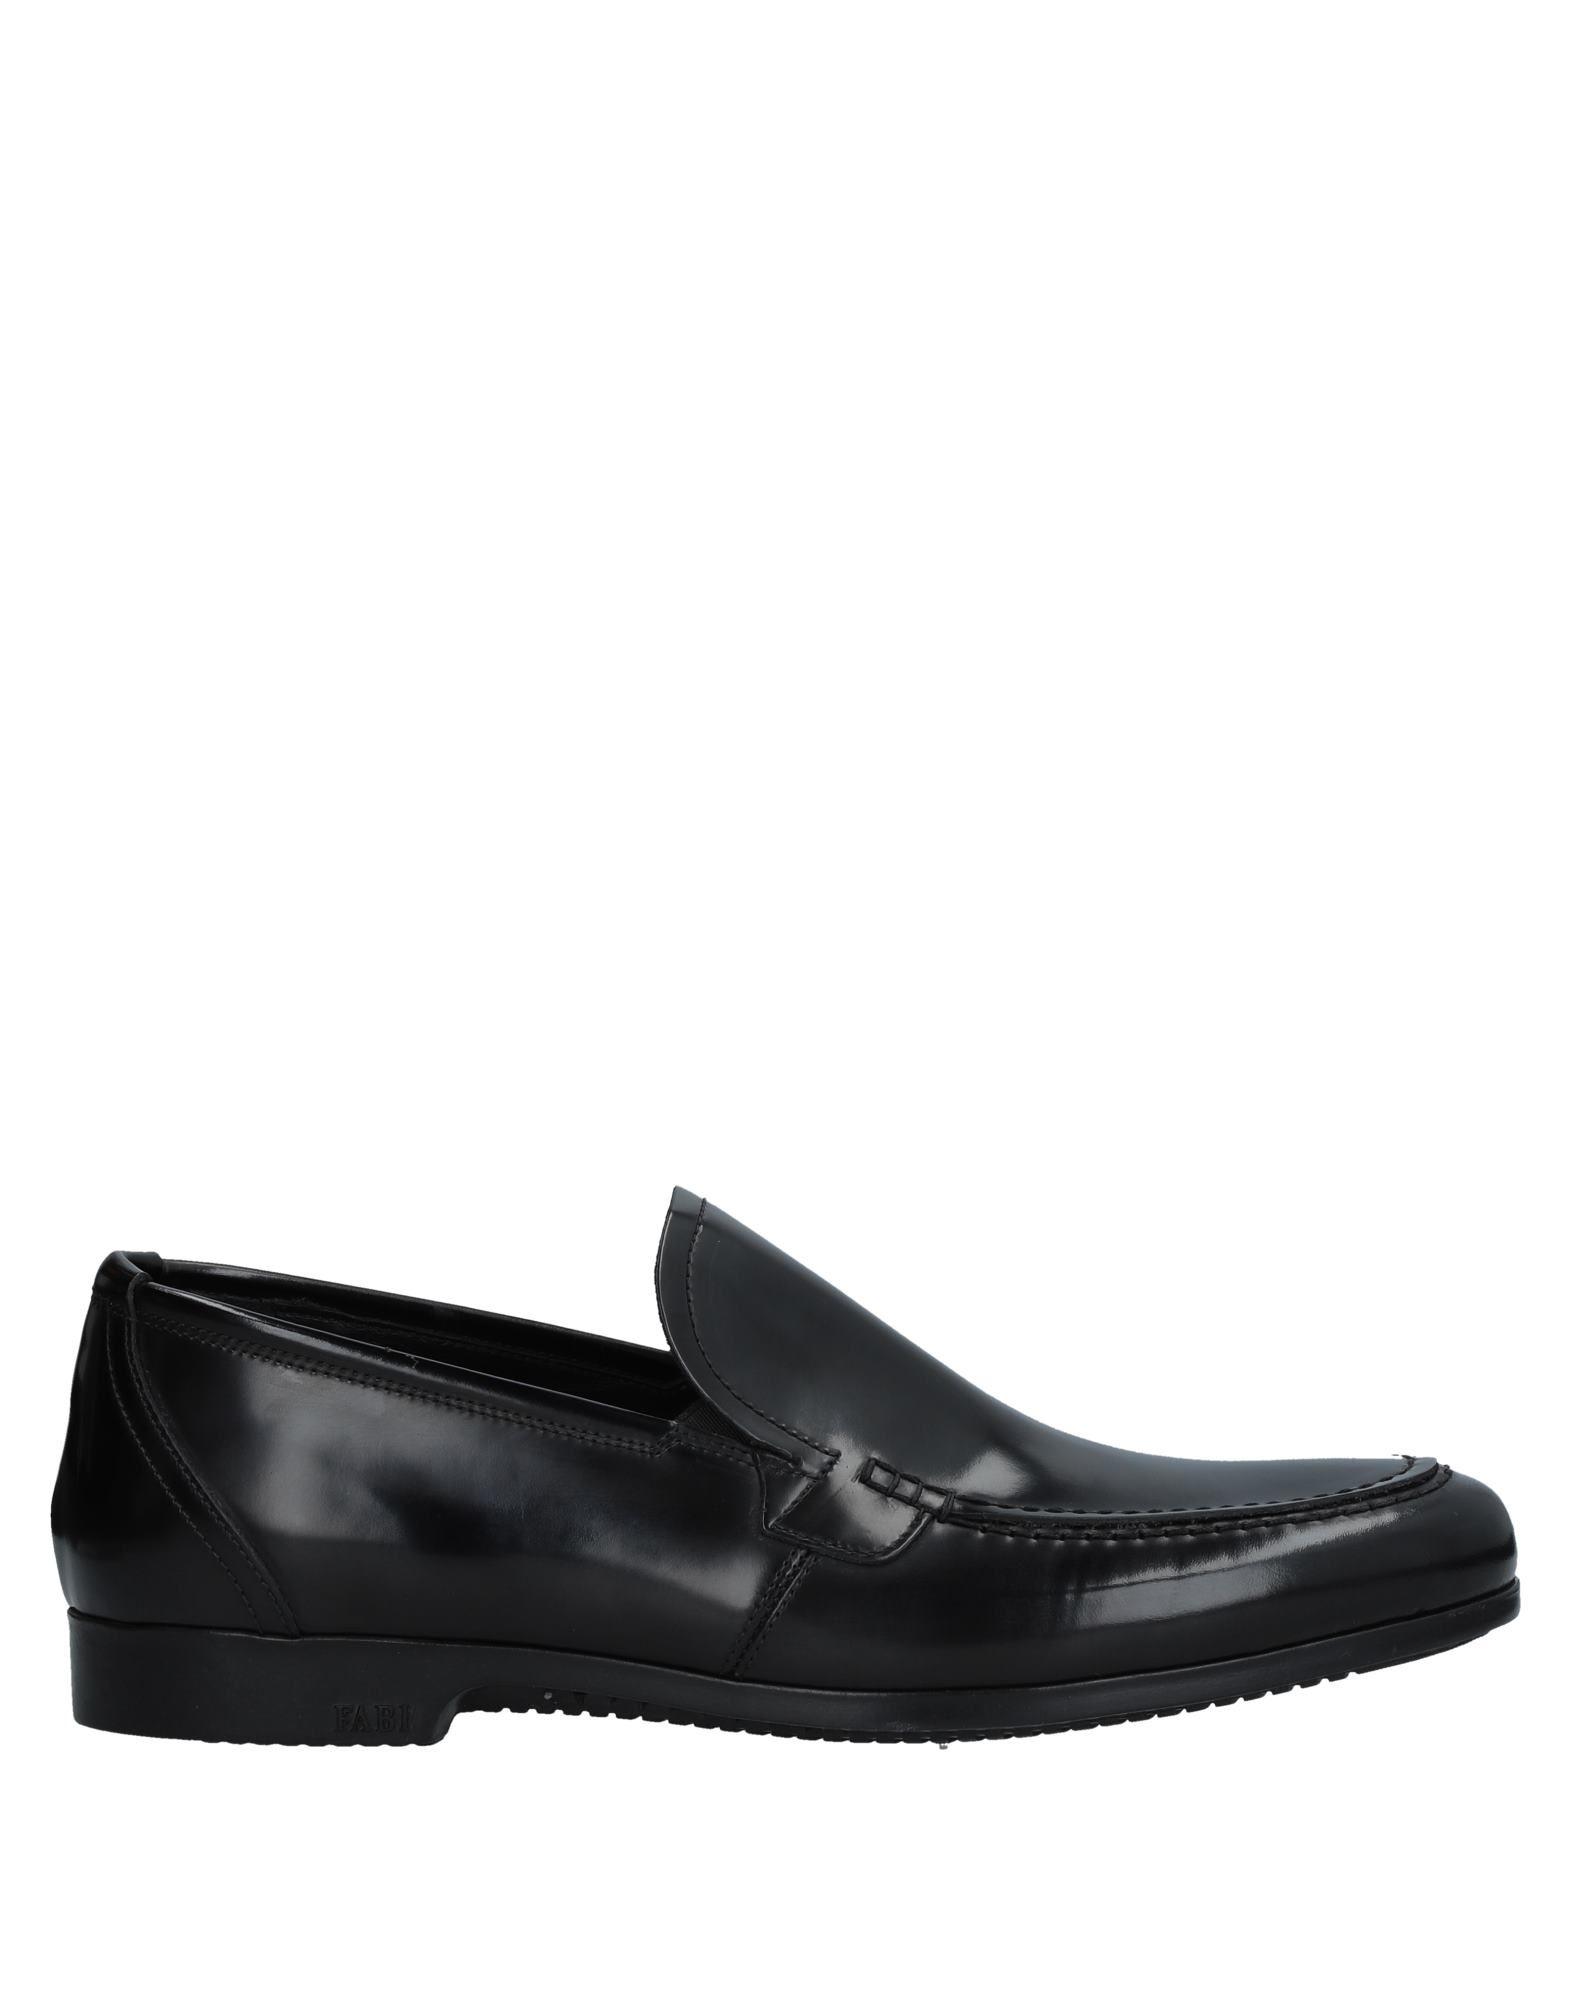 Fabi Mokassins Herren  11543258XV Gute Qualität beliebte Schuhe